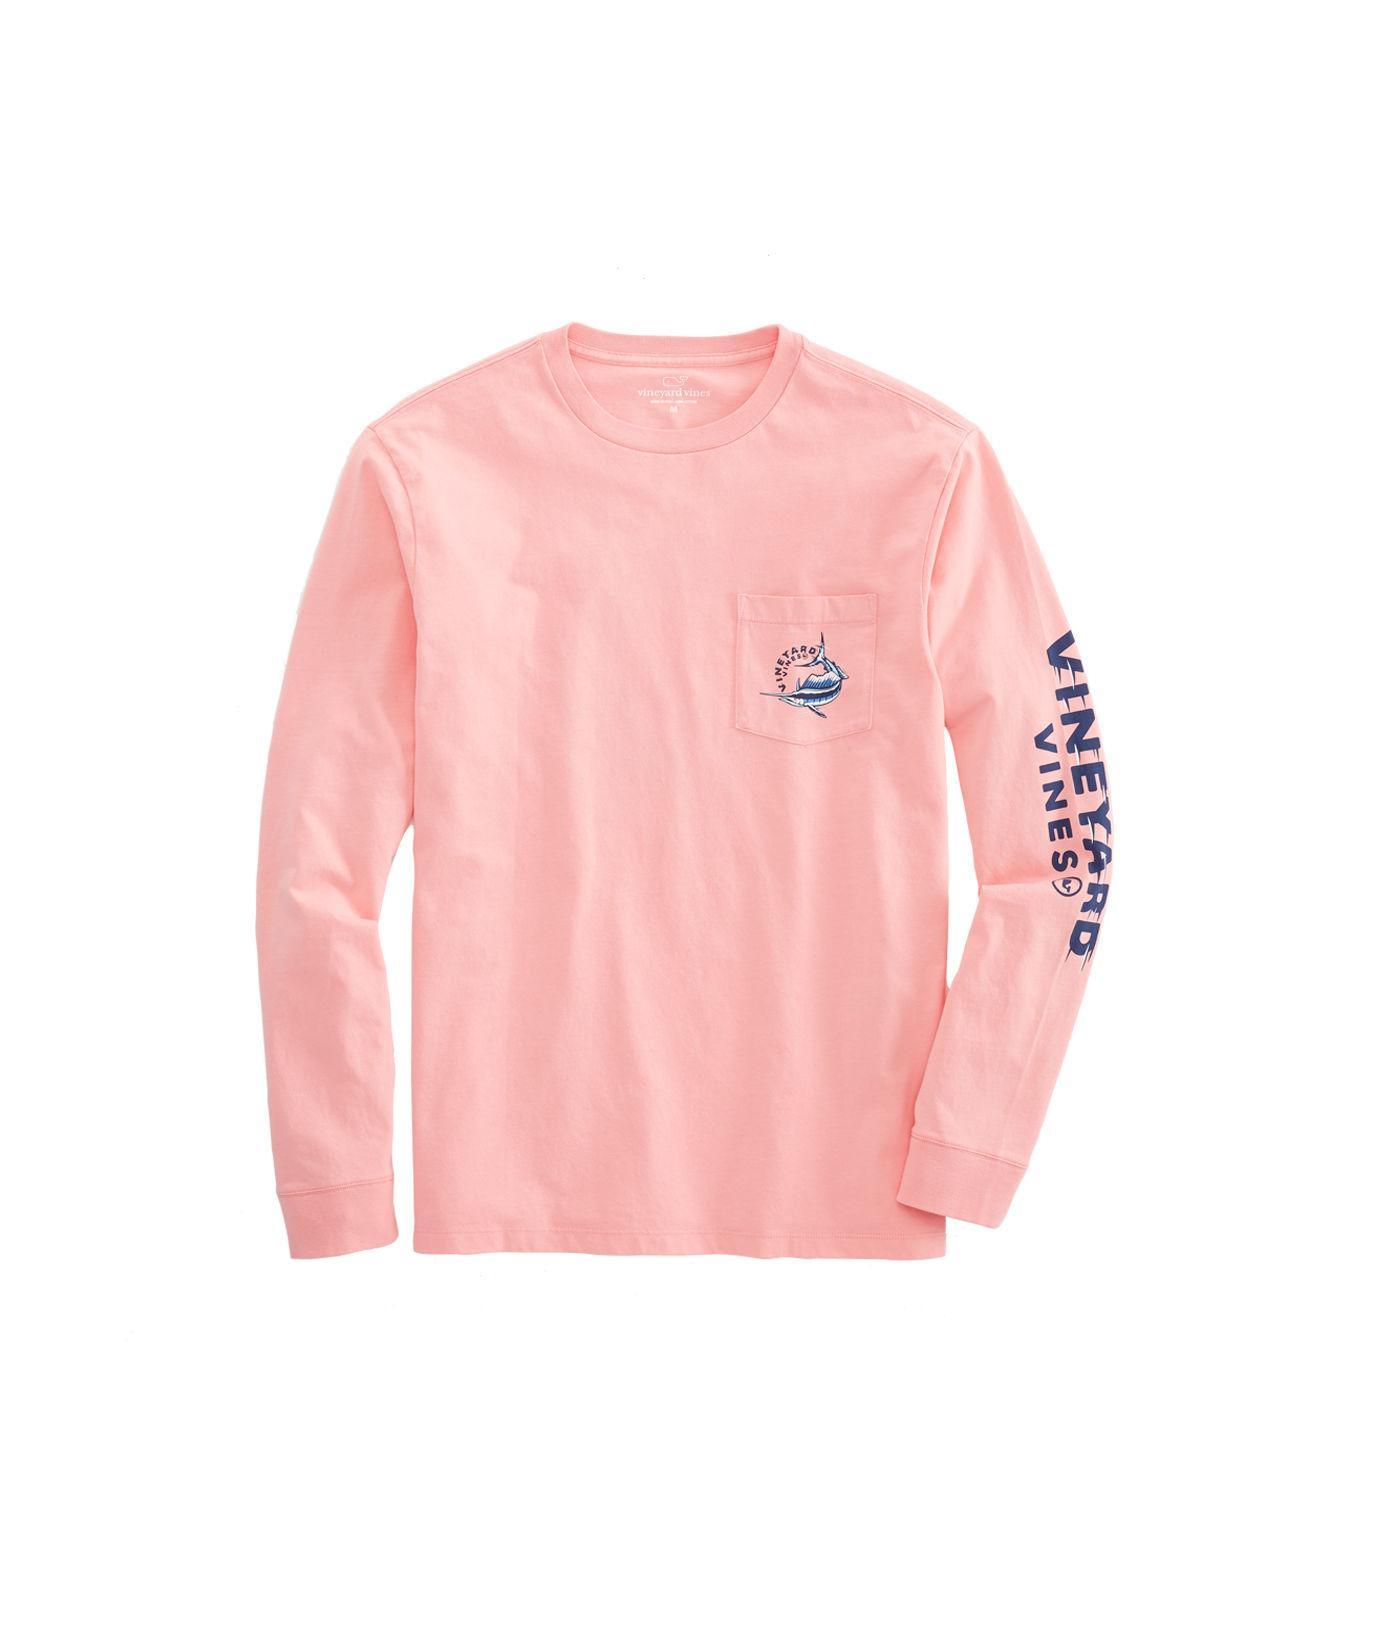 Lyst - Vineyard Vines Long-sleeve Sailfish Vortex Pocket T-shirt in Pink  for Men 290fb09f0